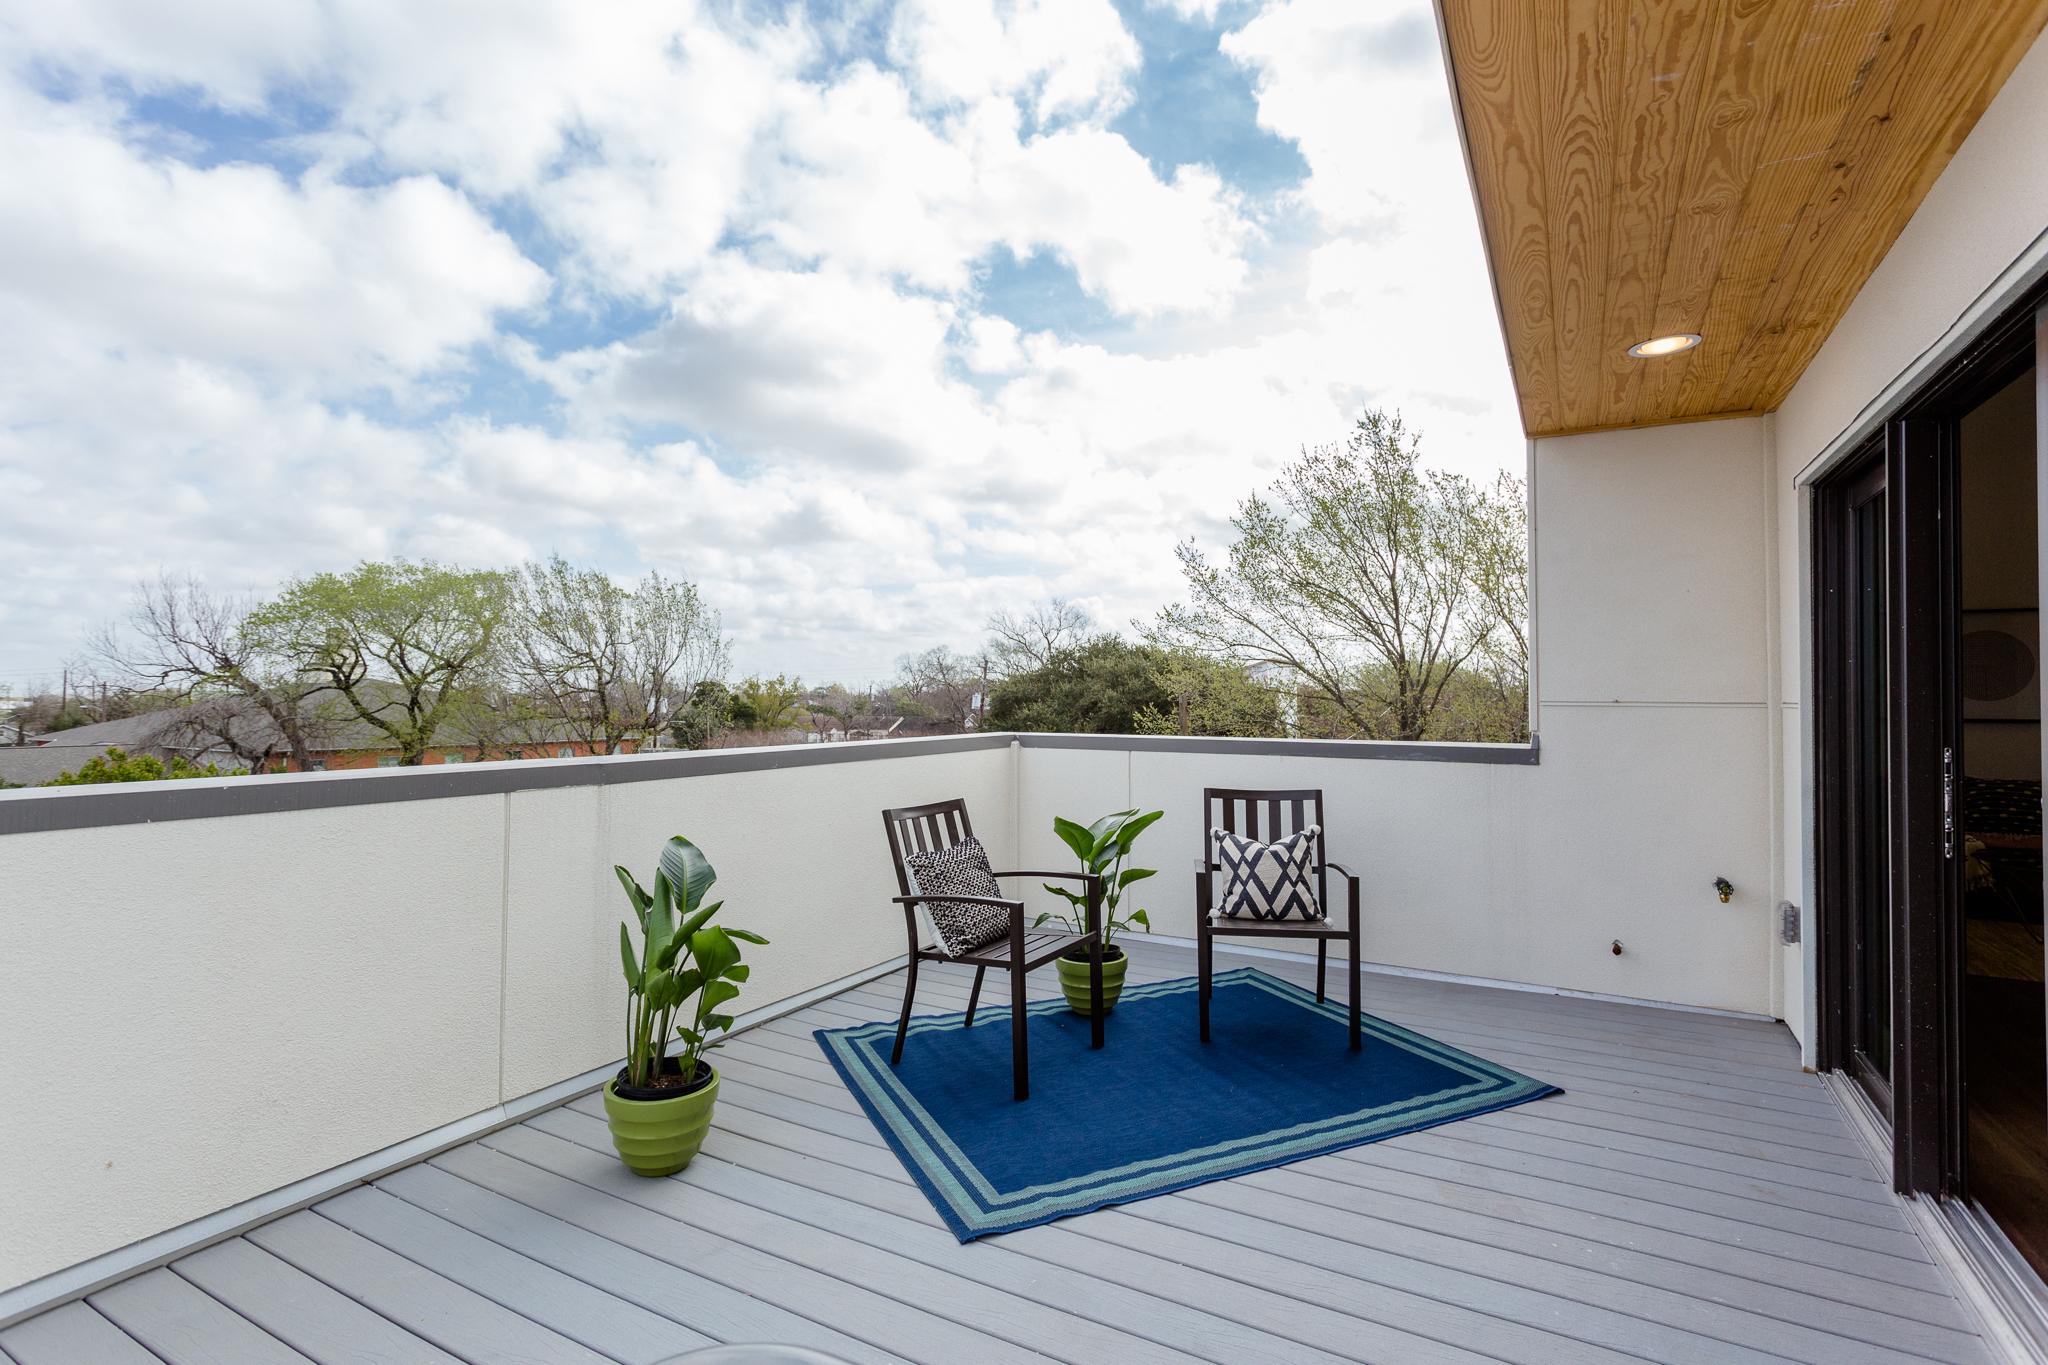 Third Story Roof Decks